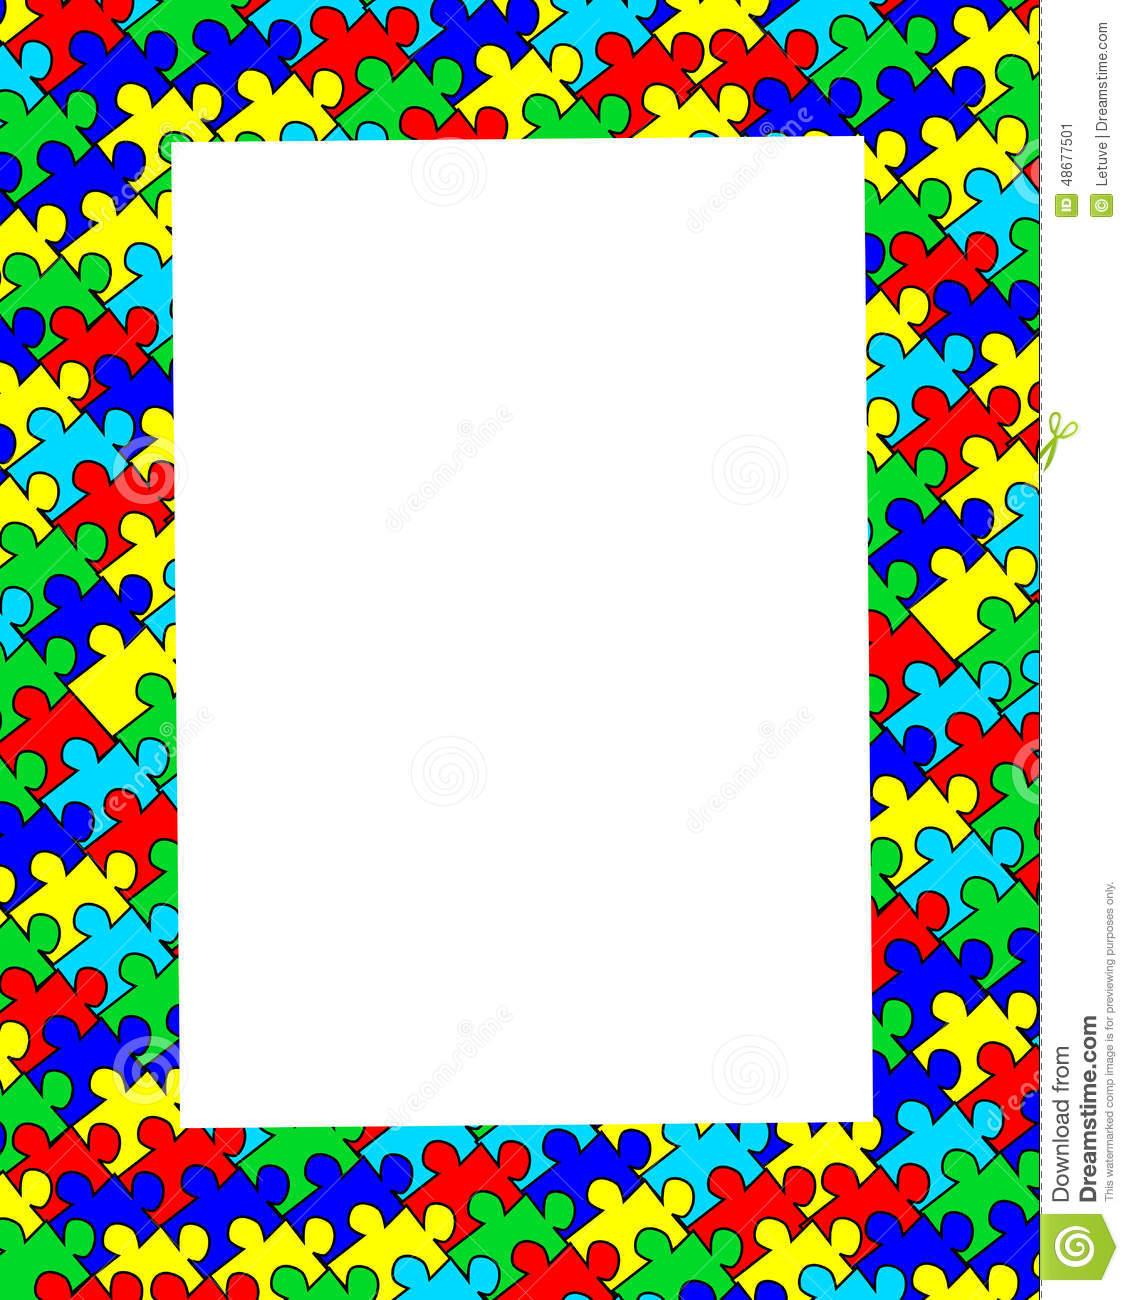 Autism clip art border graphic freeuse stock Autism Border Clipart graphic freeuse stock